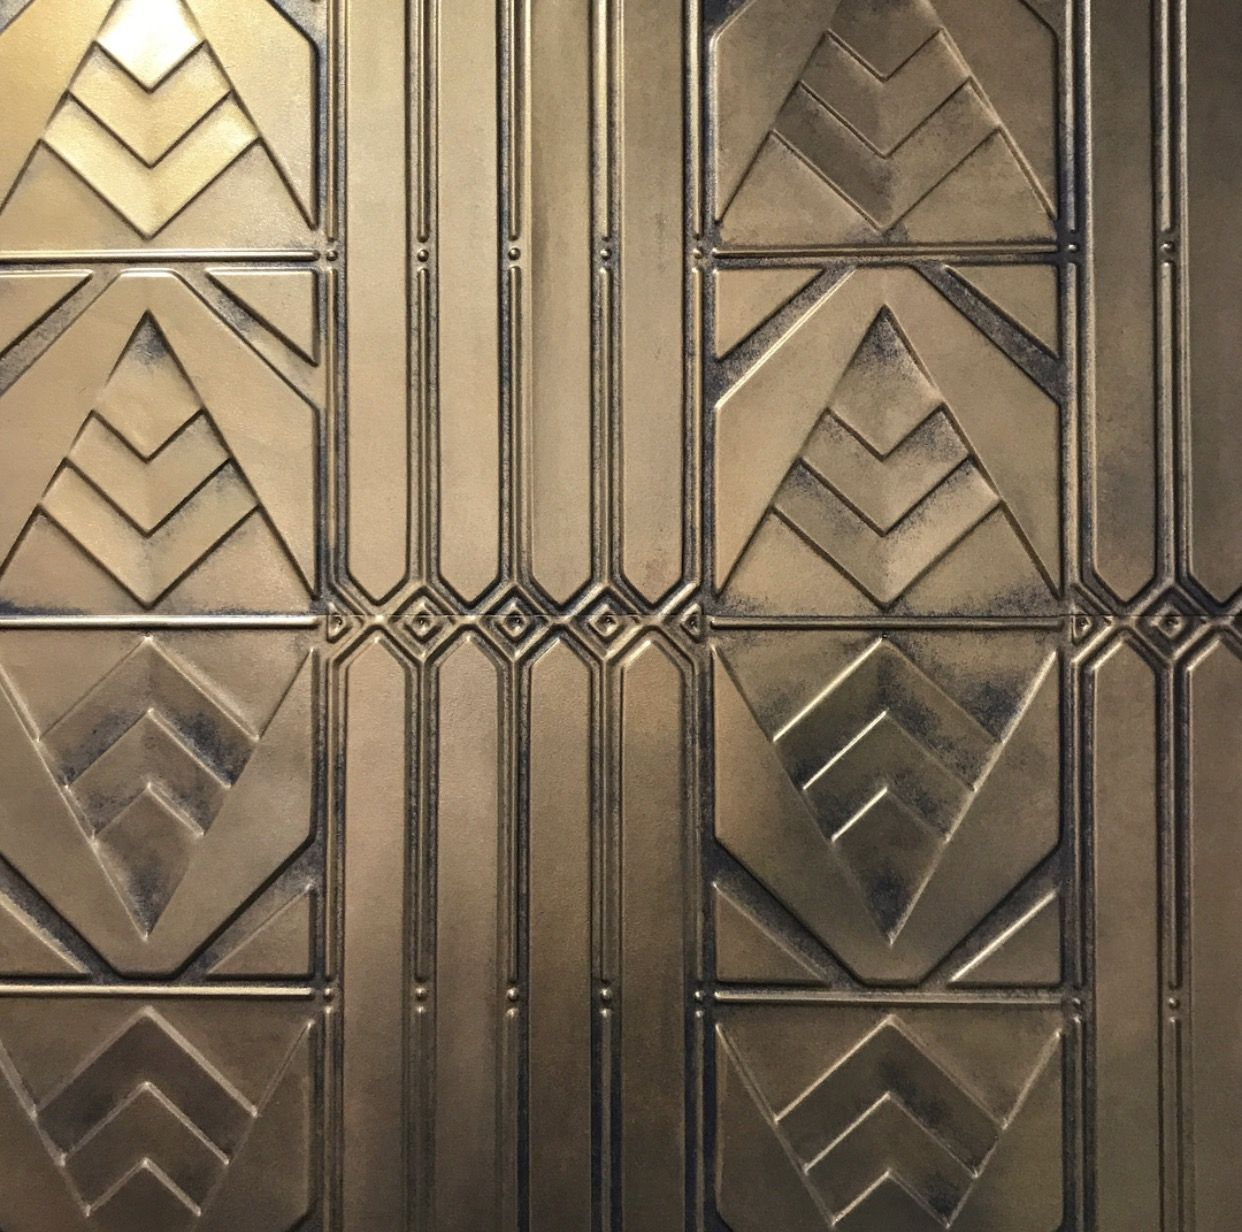 Brass Look Pressed Metal Panel In Art Deco Design The Oaks Sydney Pressed Metal Supply Install And Pressed Metal Ceiling Pressed Metal Pressed Metal Panels